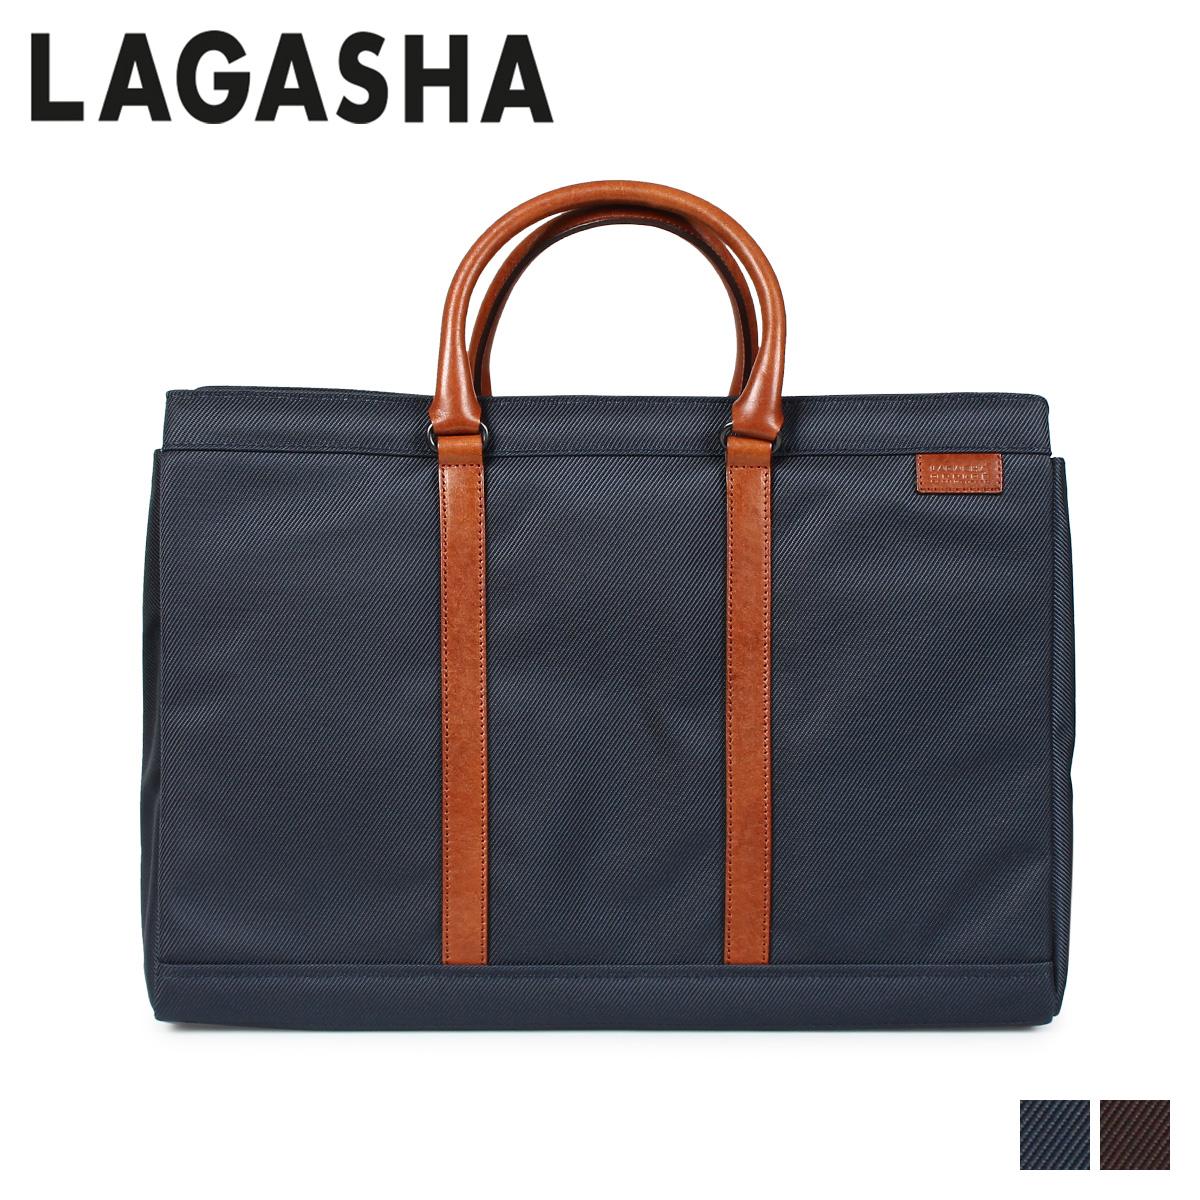 LAGASHA MOVE ラガシャ ムーヴ バッグ ビジネスバッグ ブリーフケース メンズ ネイビー ブラウン 7145